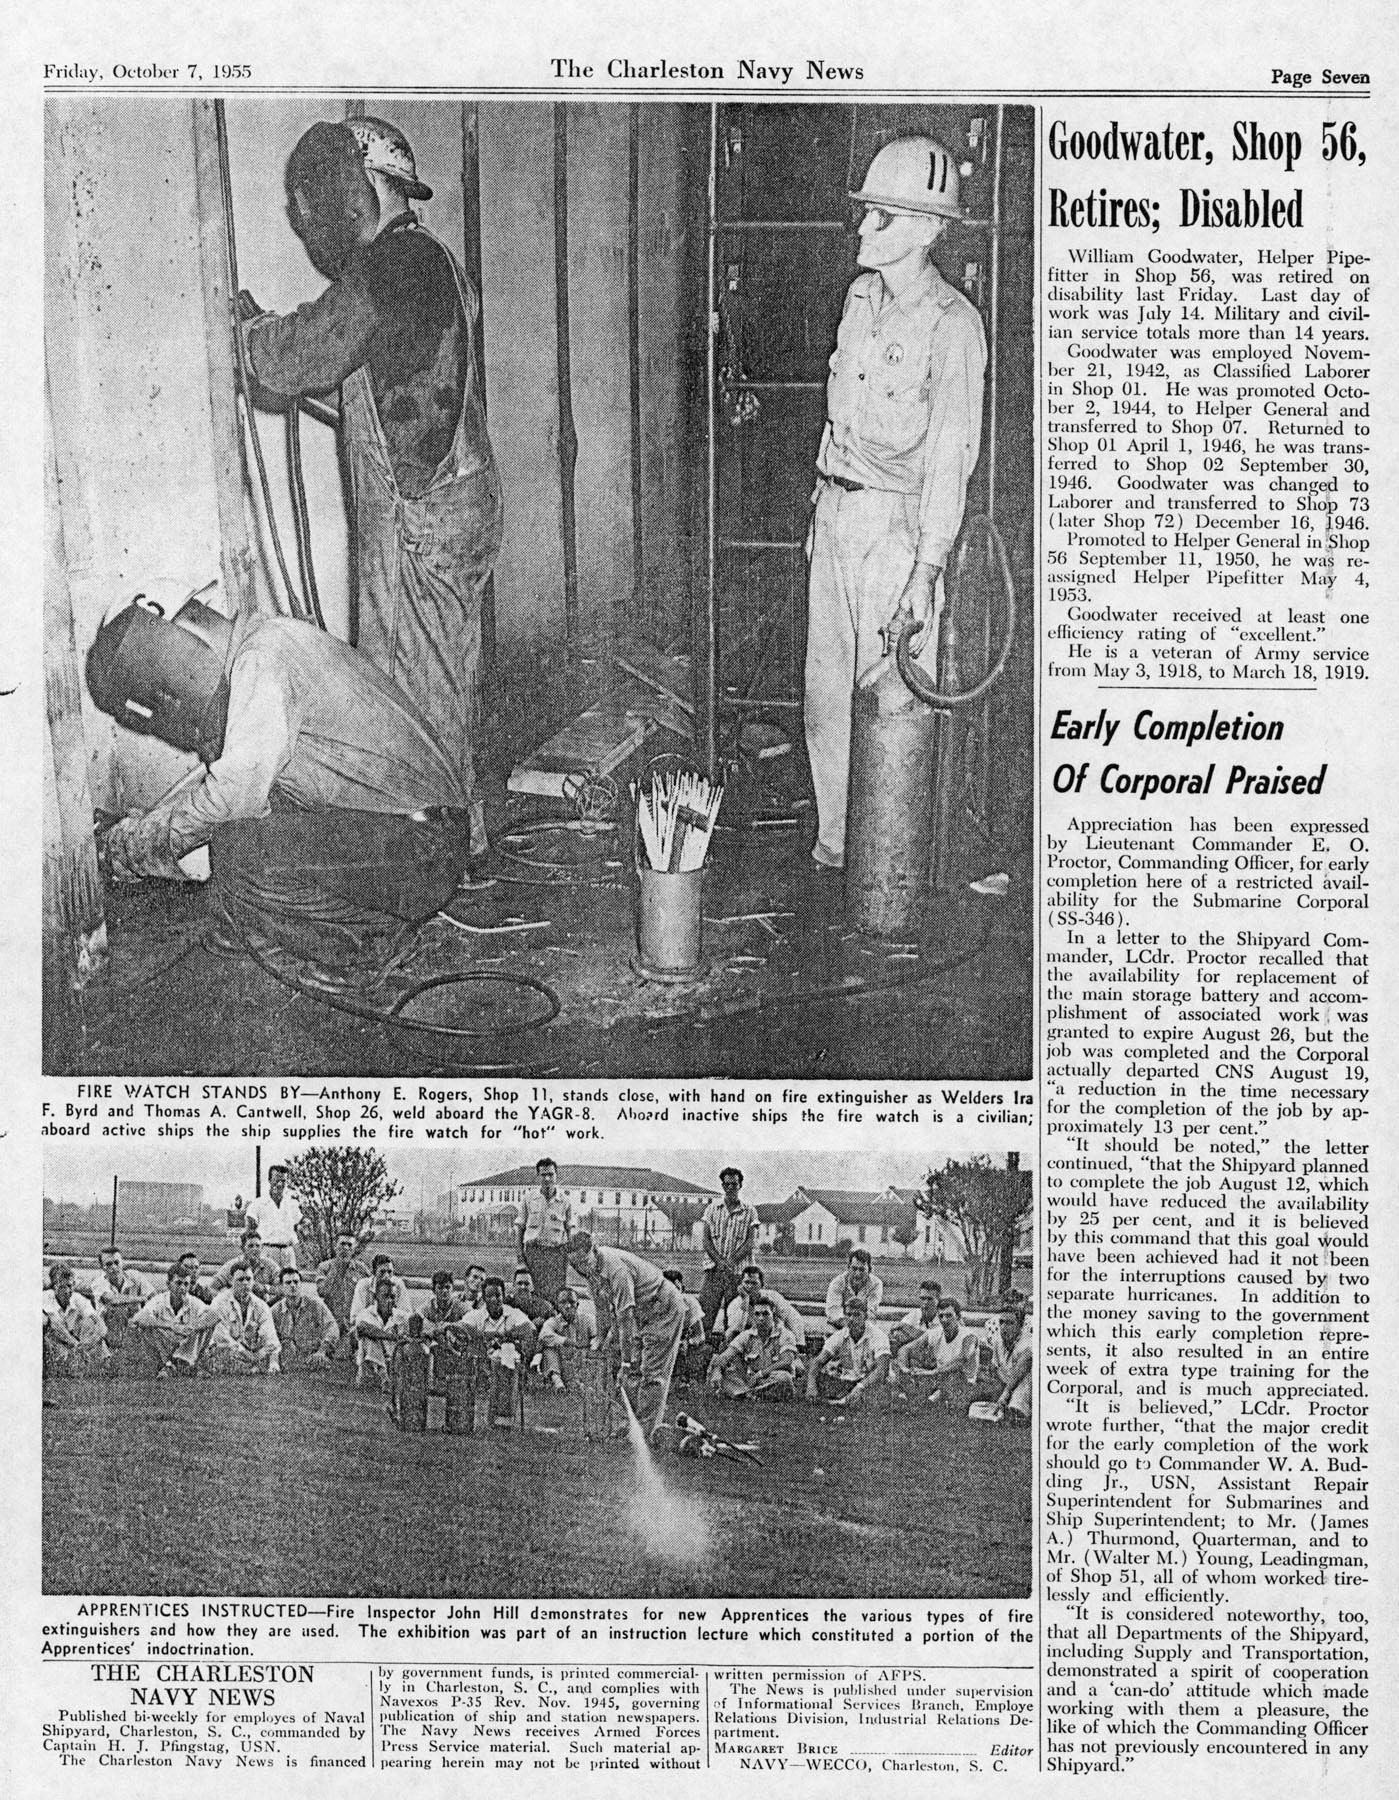 The Charleston Navy News, Volume 14, Edition 6, page vii